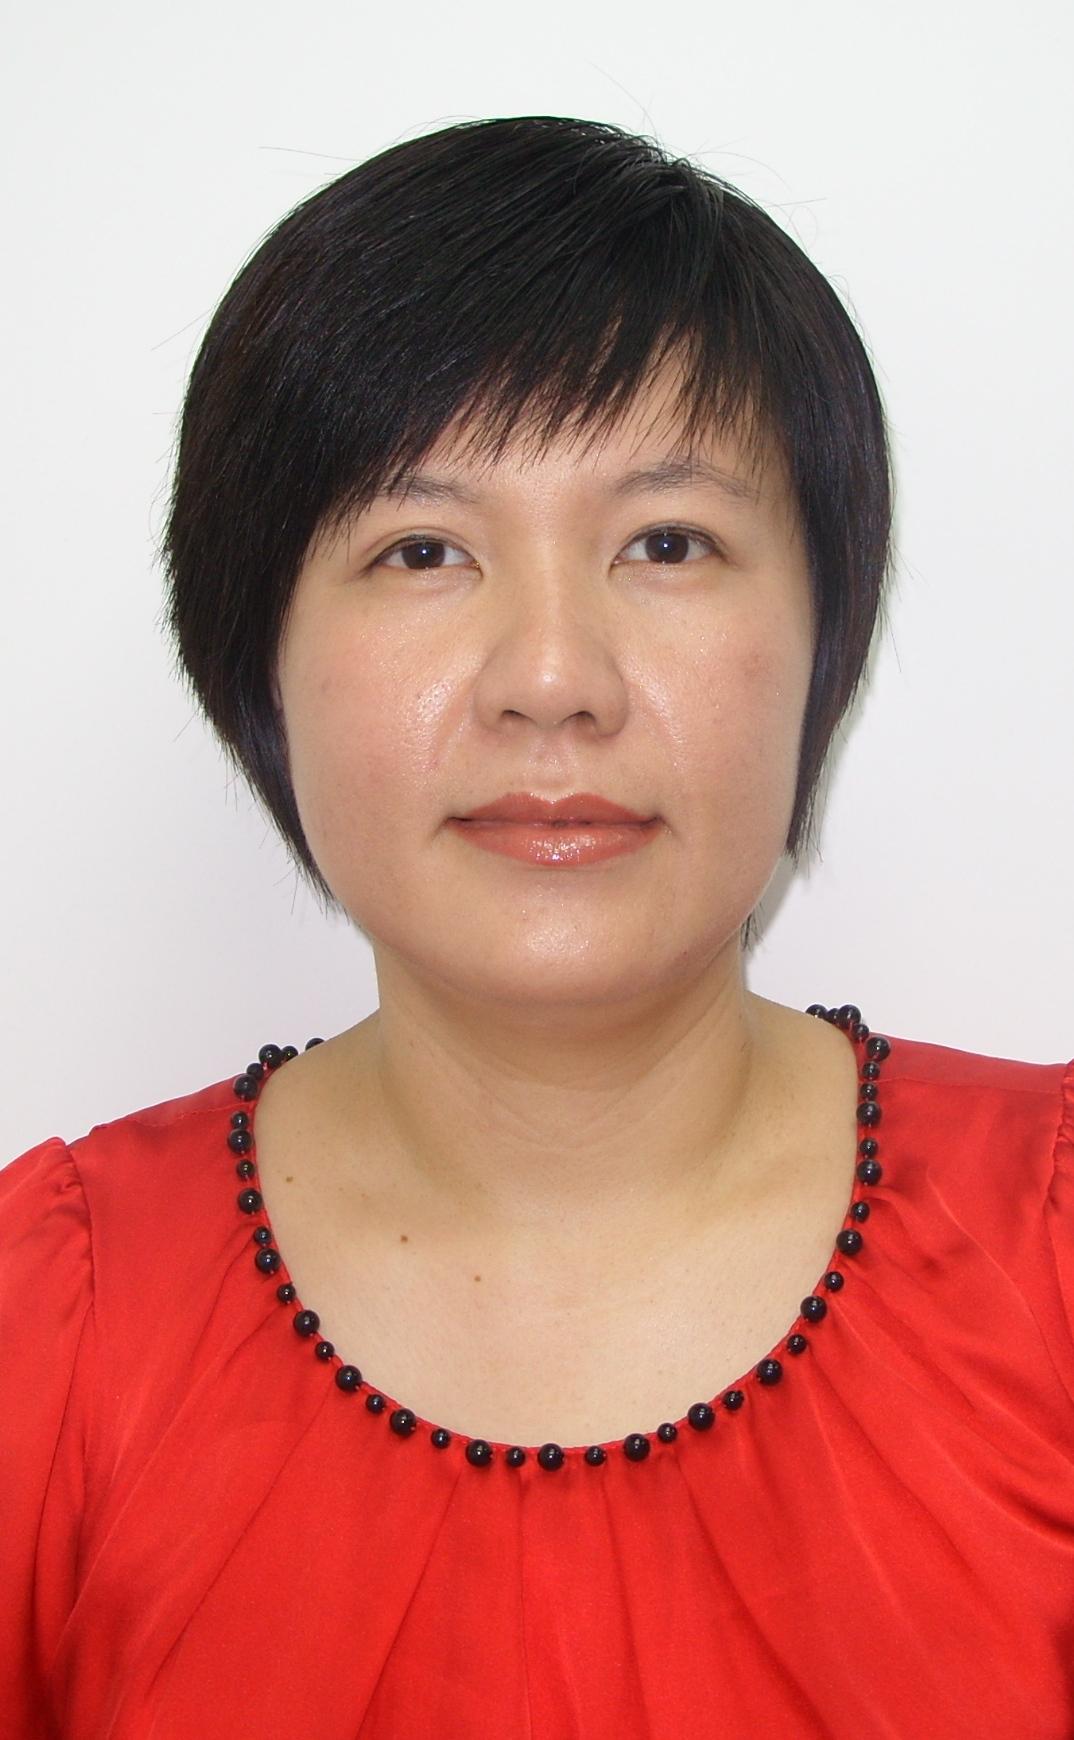 Hsiao Wey Tan